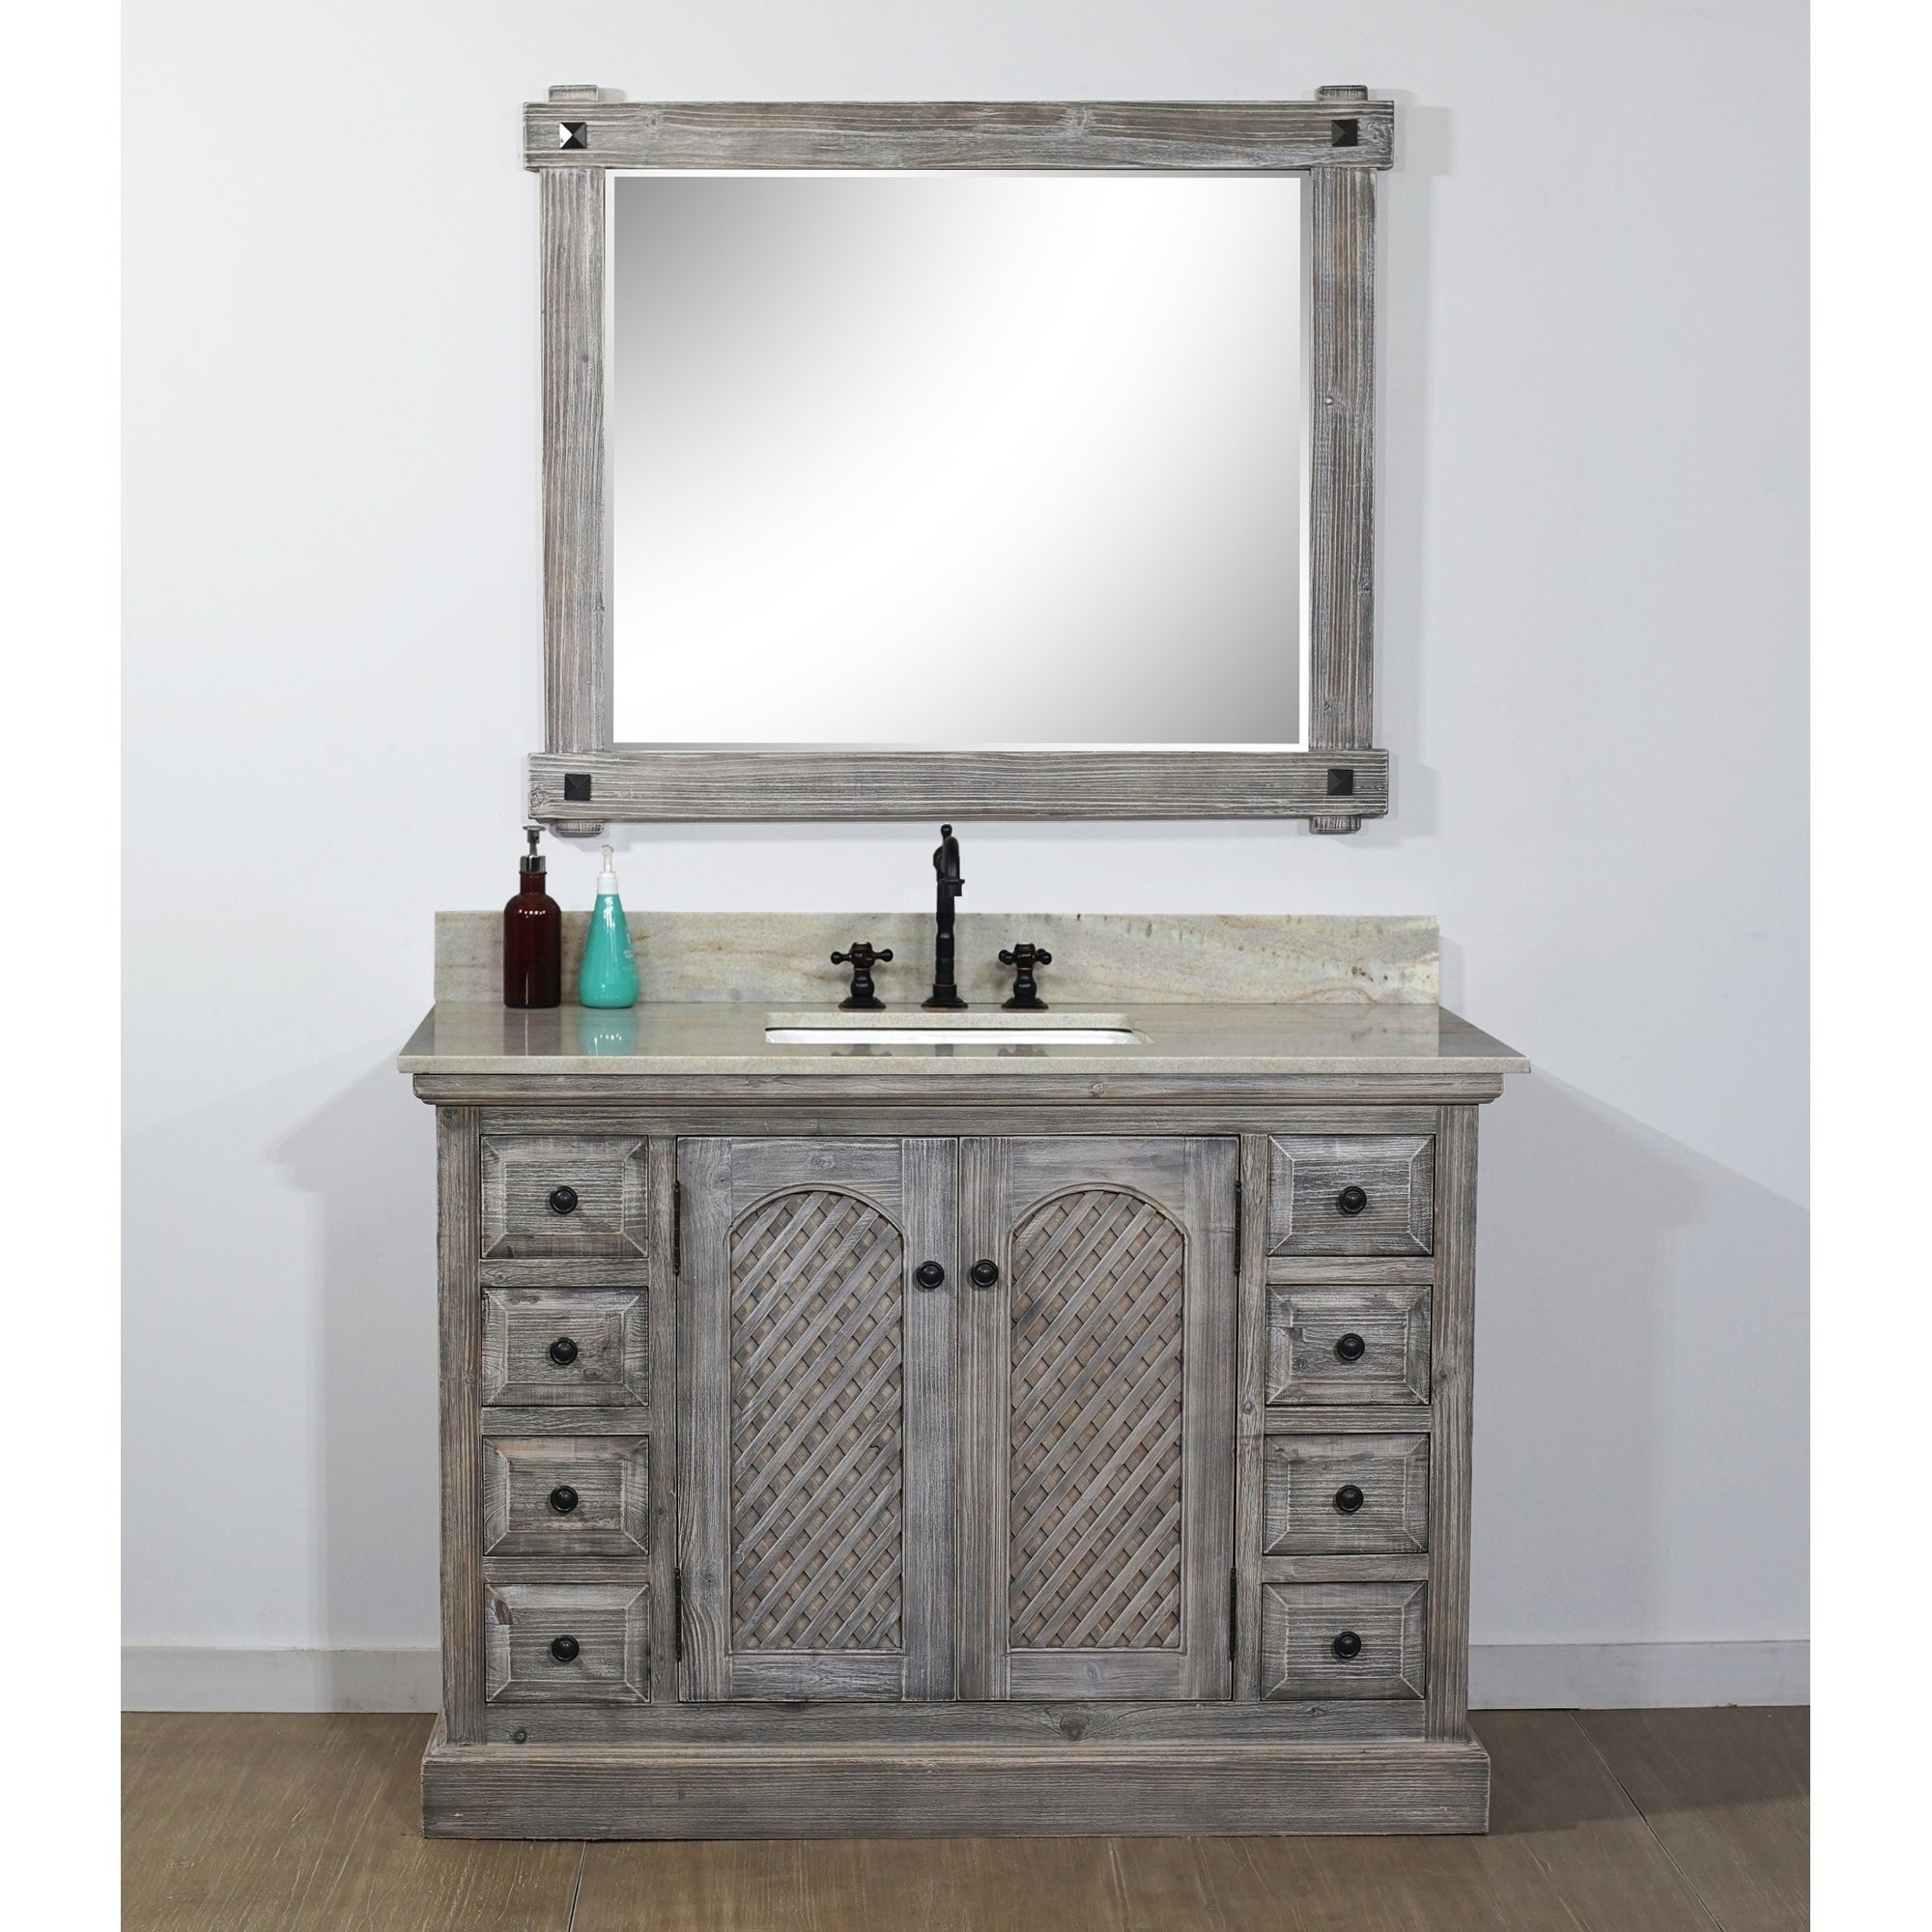 Rustic Style 48 Inch Single Sink Bathroom Vanity With Coastal Sand Marble Top No Faucet Overstock 30574947 Wk1948 Grey Driftwood Shuttered Door